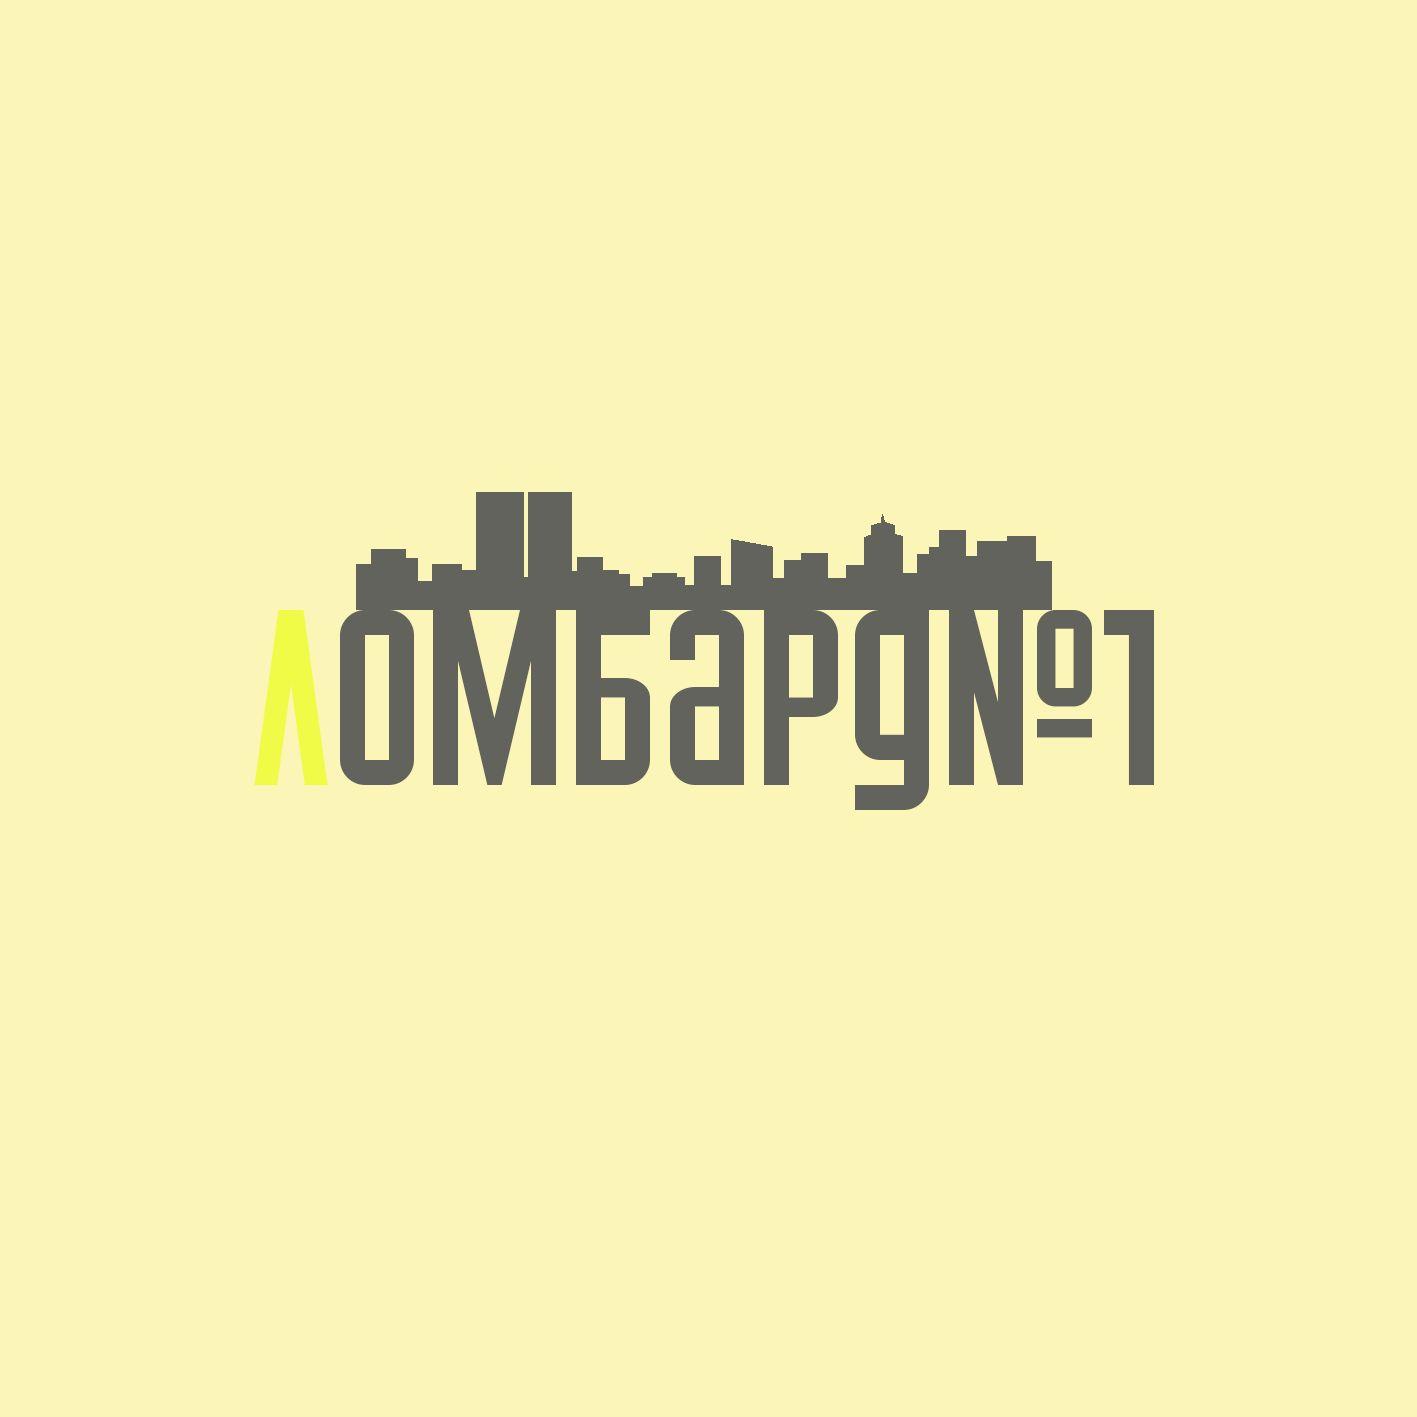 Дизайн логотипа Ломбард №1 - дизайнер Denis_Volodin